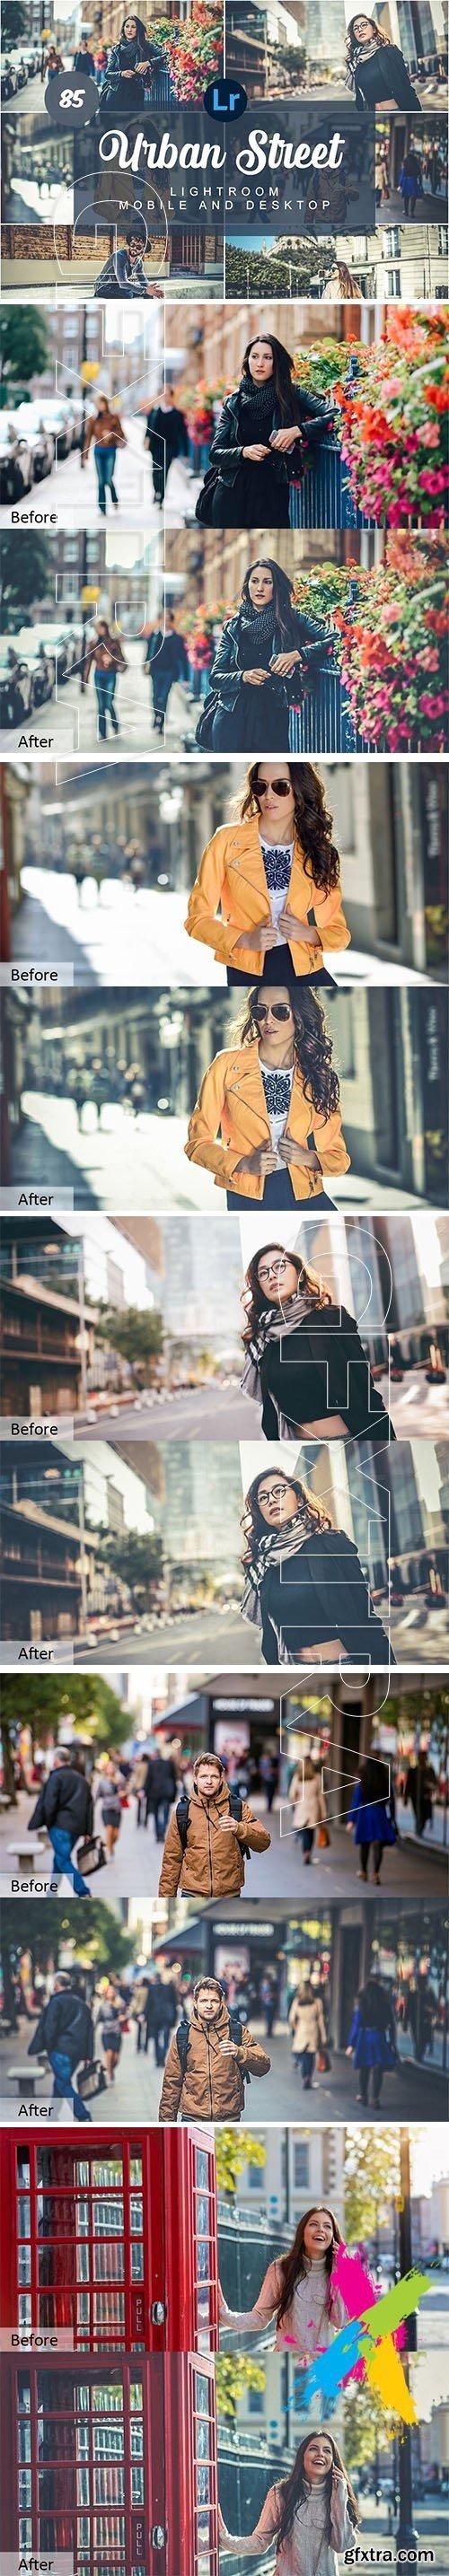 CreativeMarket - Urban Street Mobile PRESETS 5736468